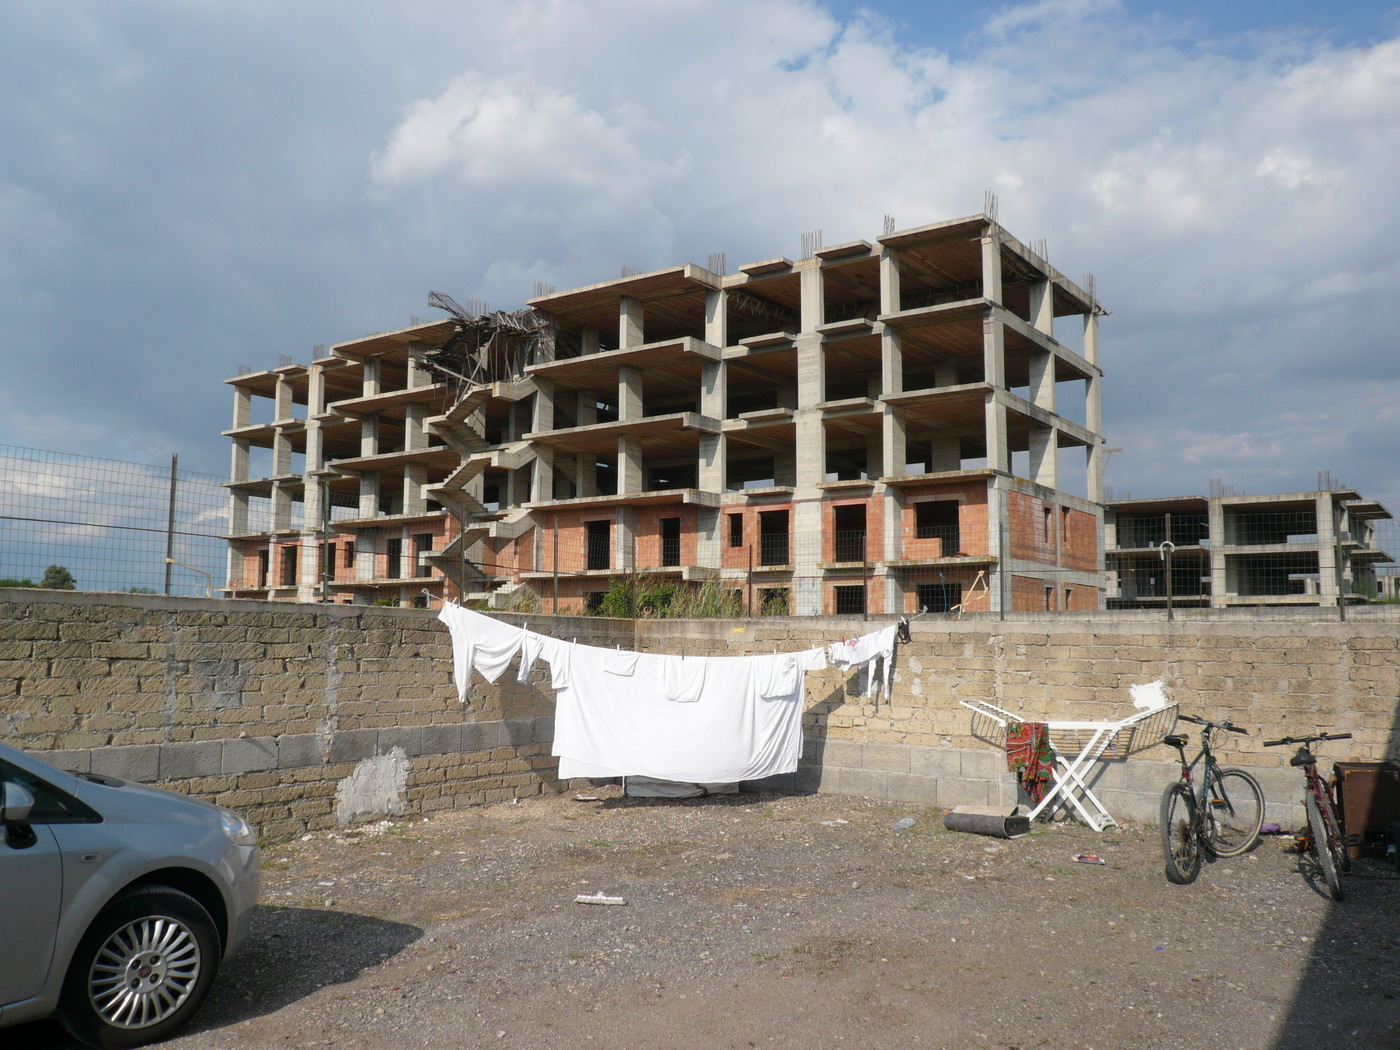 Castel Volturno Italy  city photos gallery : Castel Volturno massacre